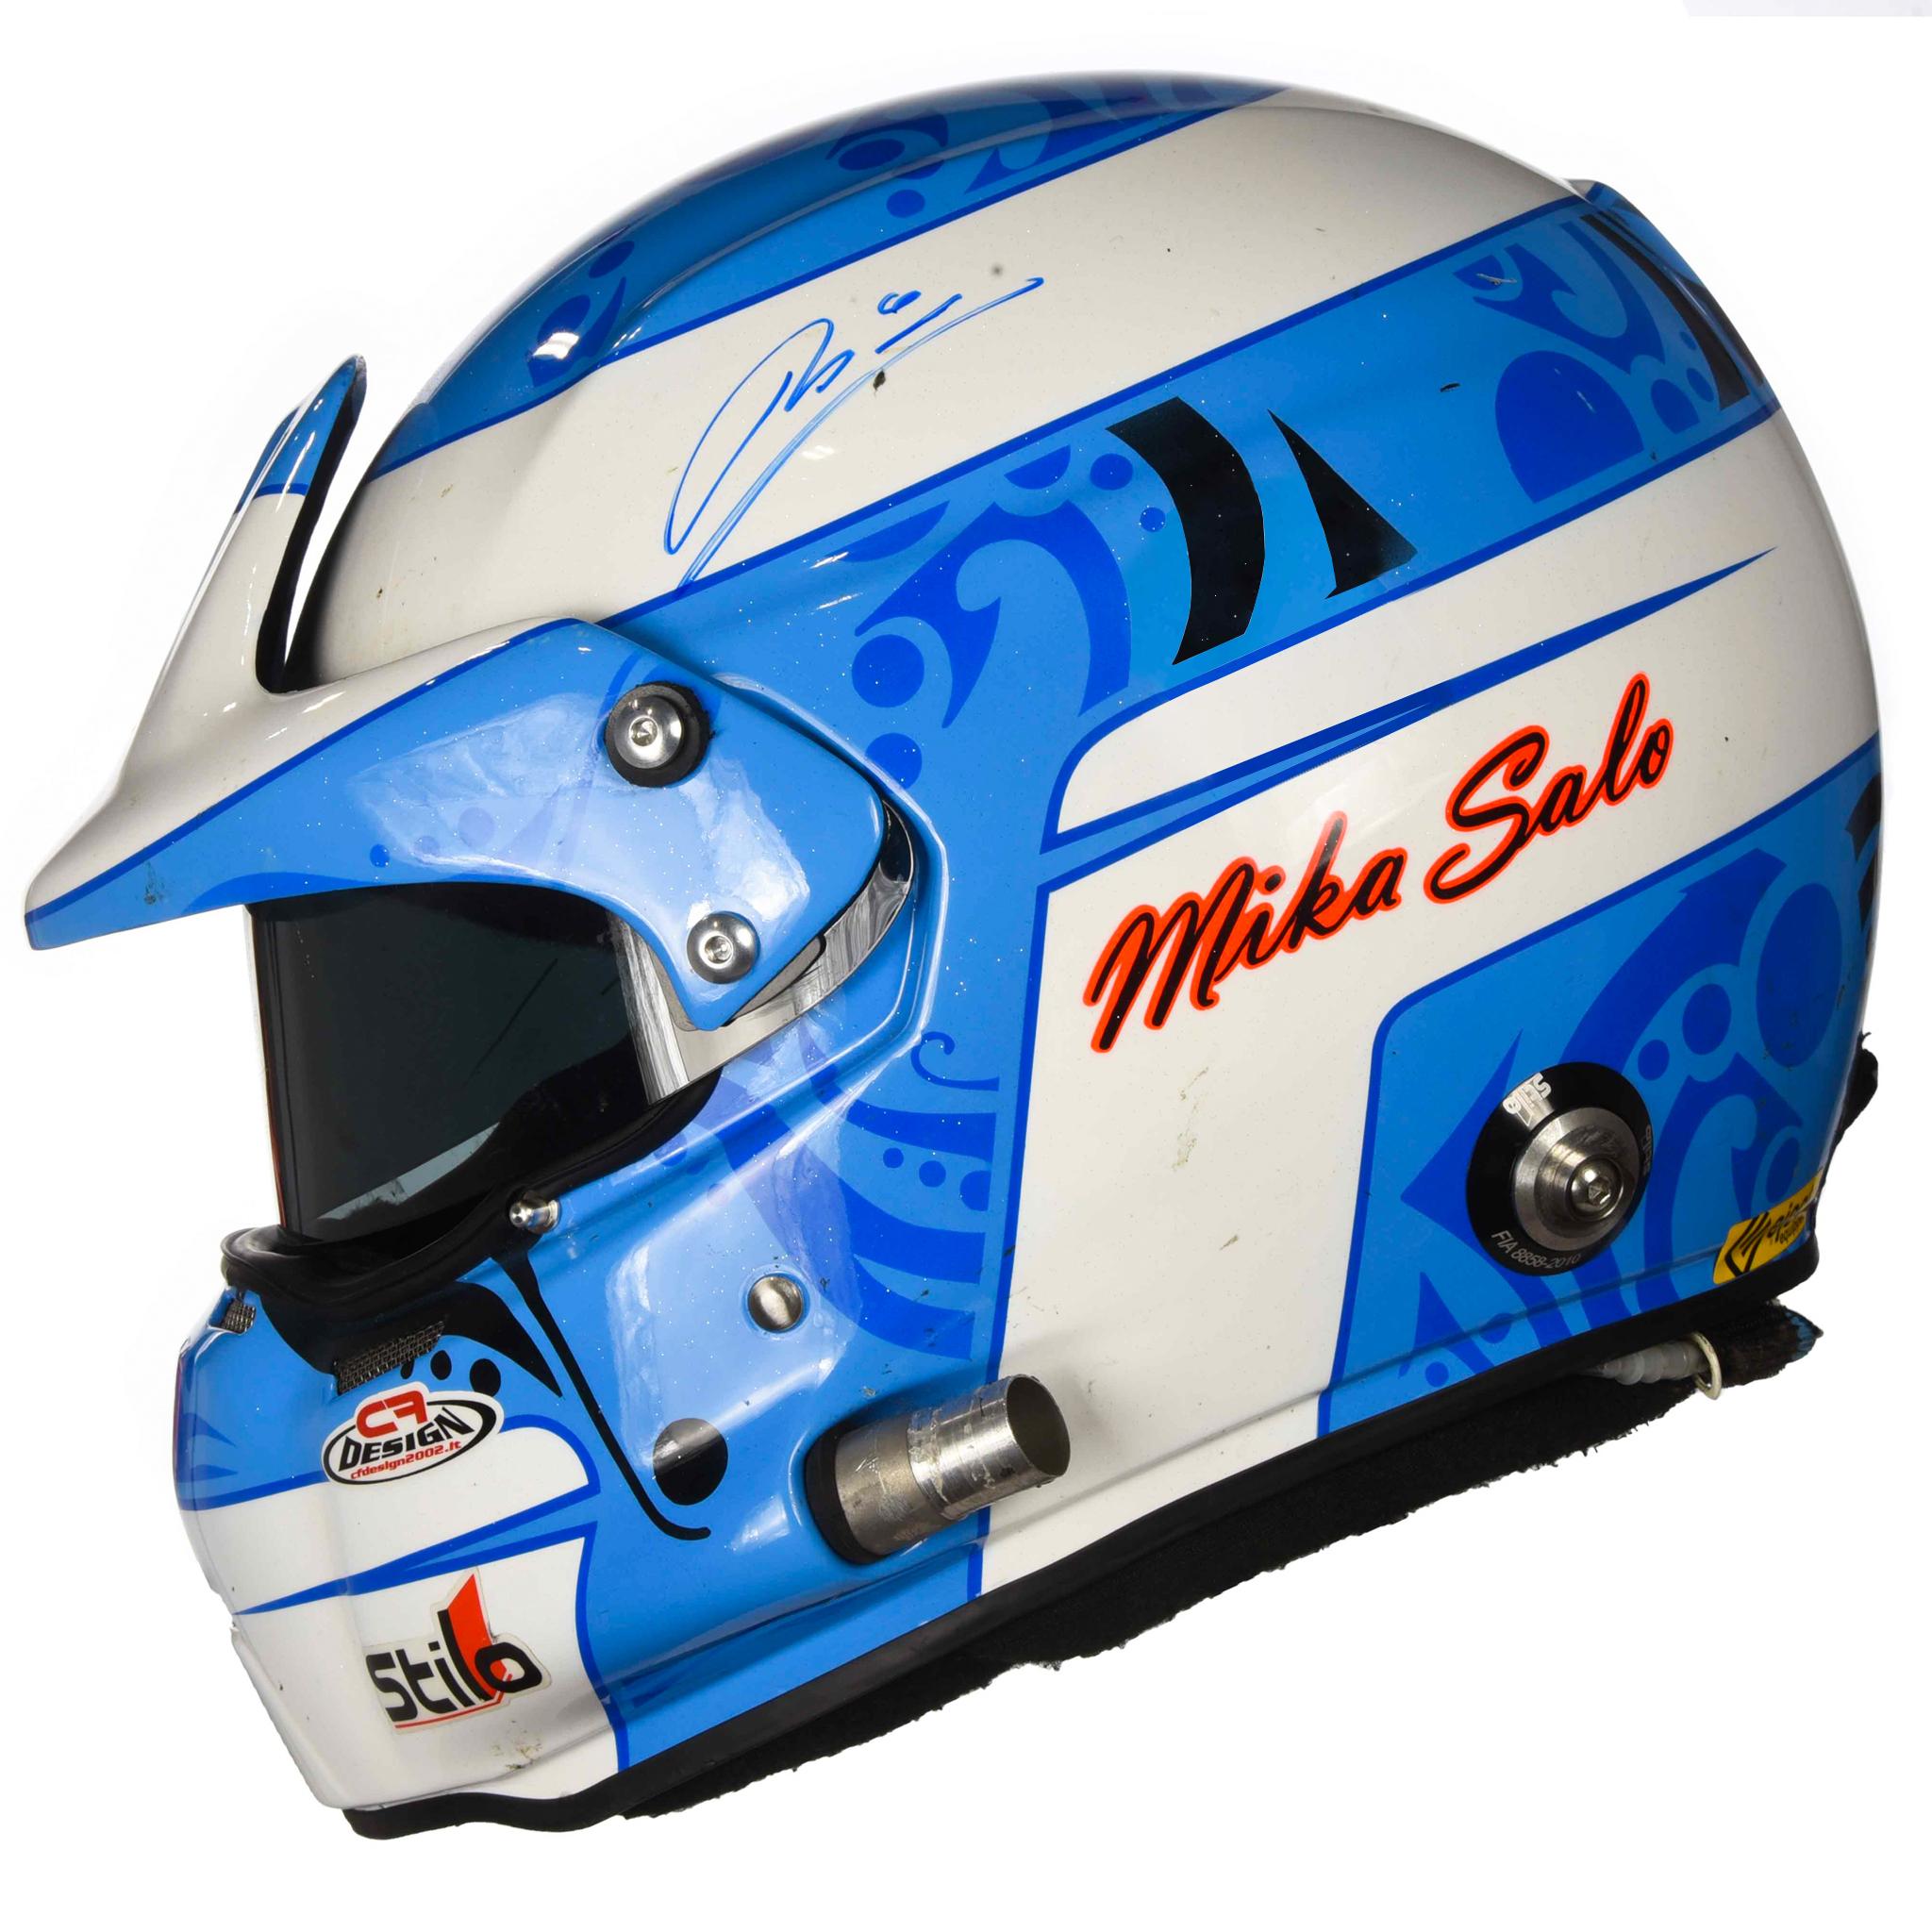 2011 12 Mika Salo Signed Race Winning V8 Supercar Sebring 12 Hour Ferrari Stilo St4 Wgt Helmet Racing Hall Of Fame Collection